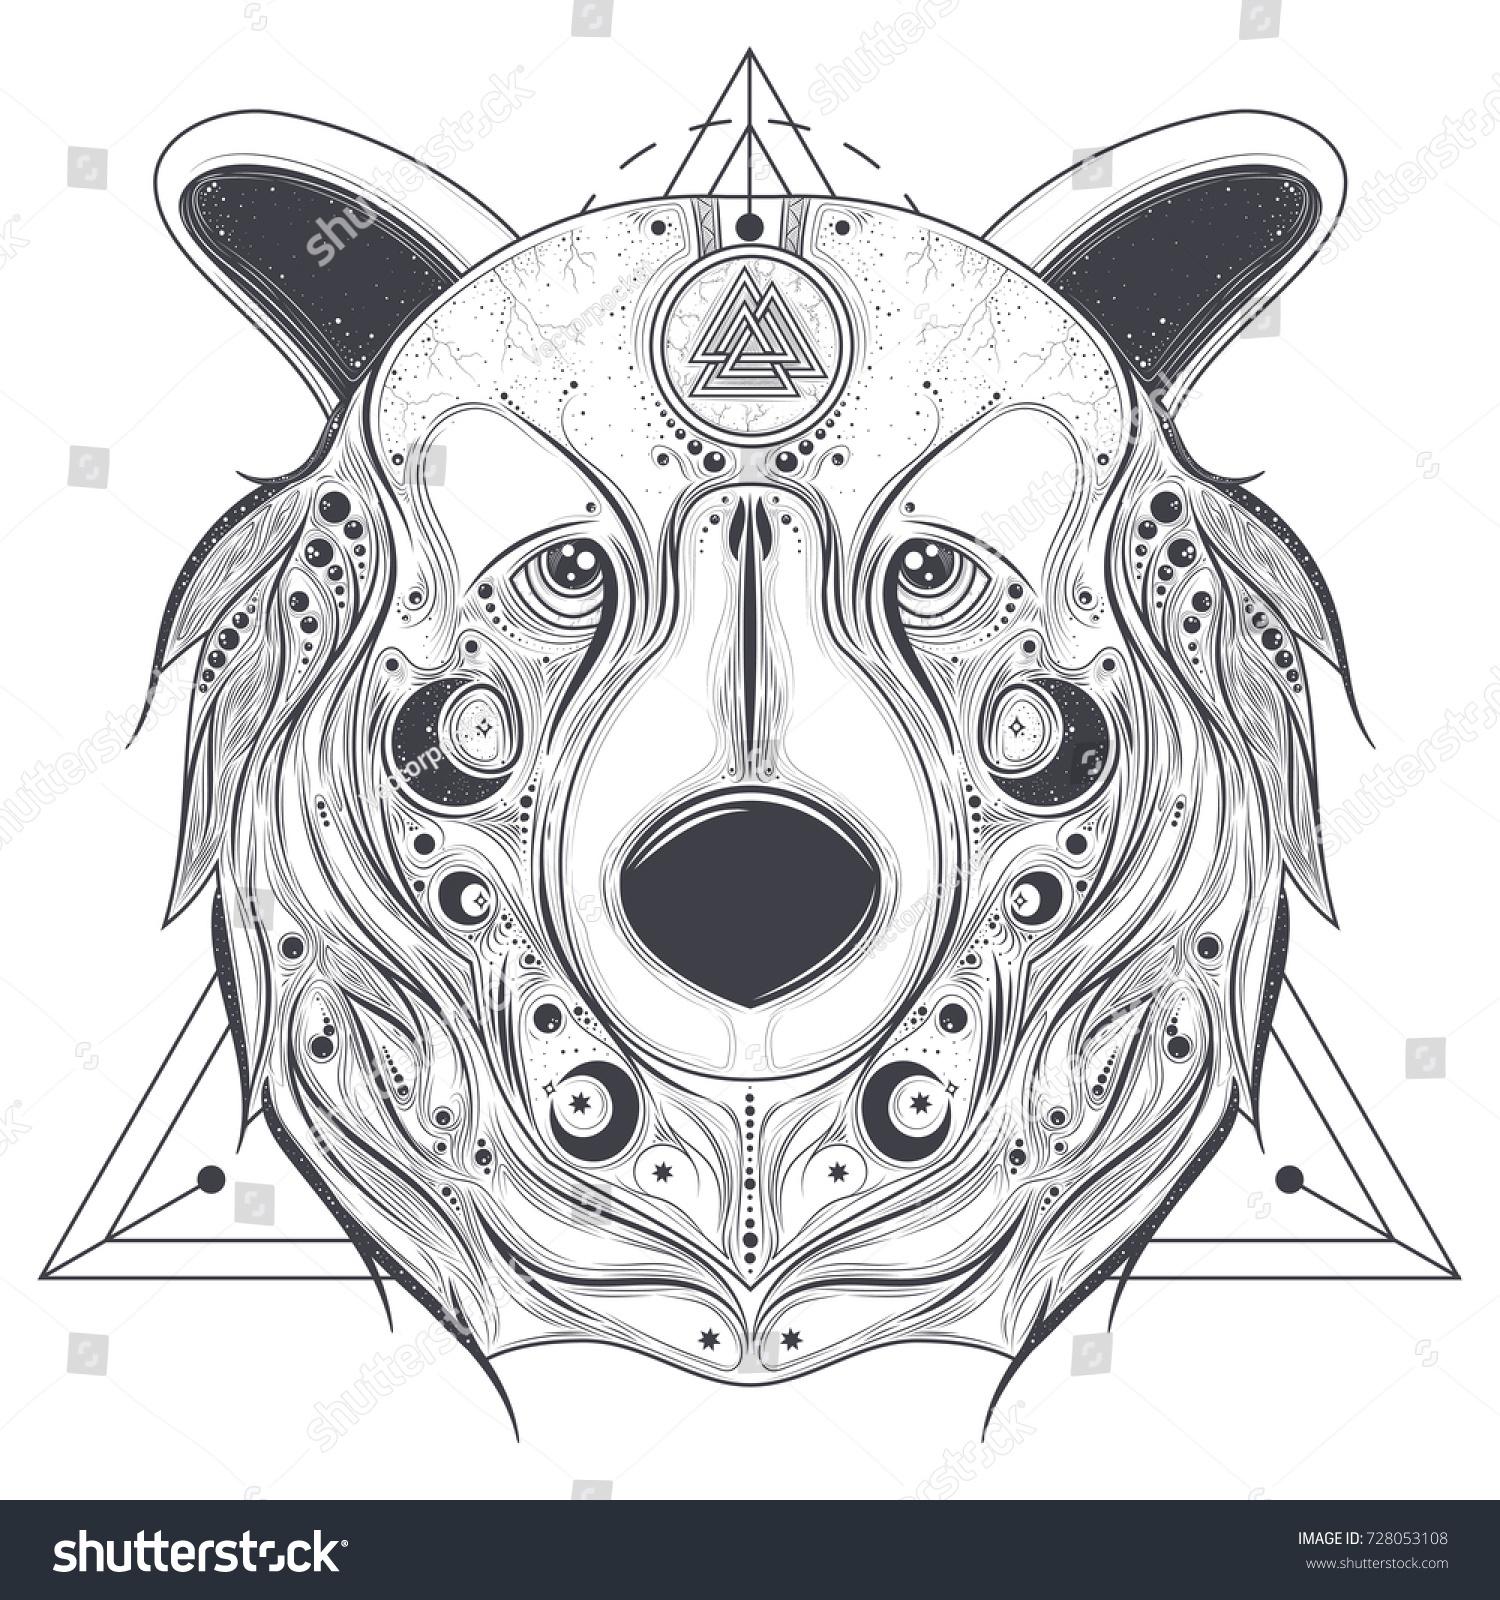 Grizzly bear head ancient pagan valknut stock vector 728053108 grizzly bear head with ancient pagan valknut symbol on forehead line art vector illustration isolated on biocorpaavc